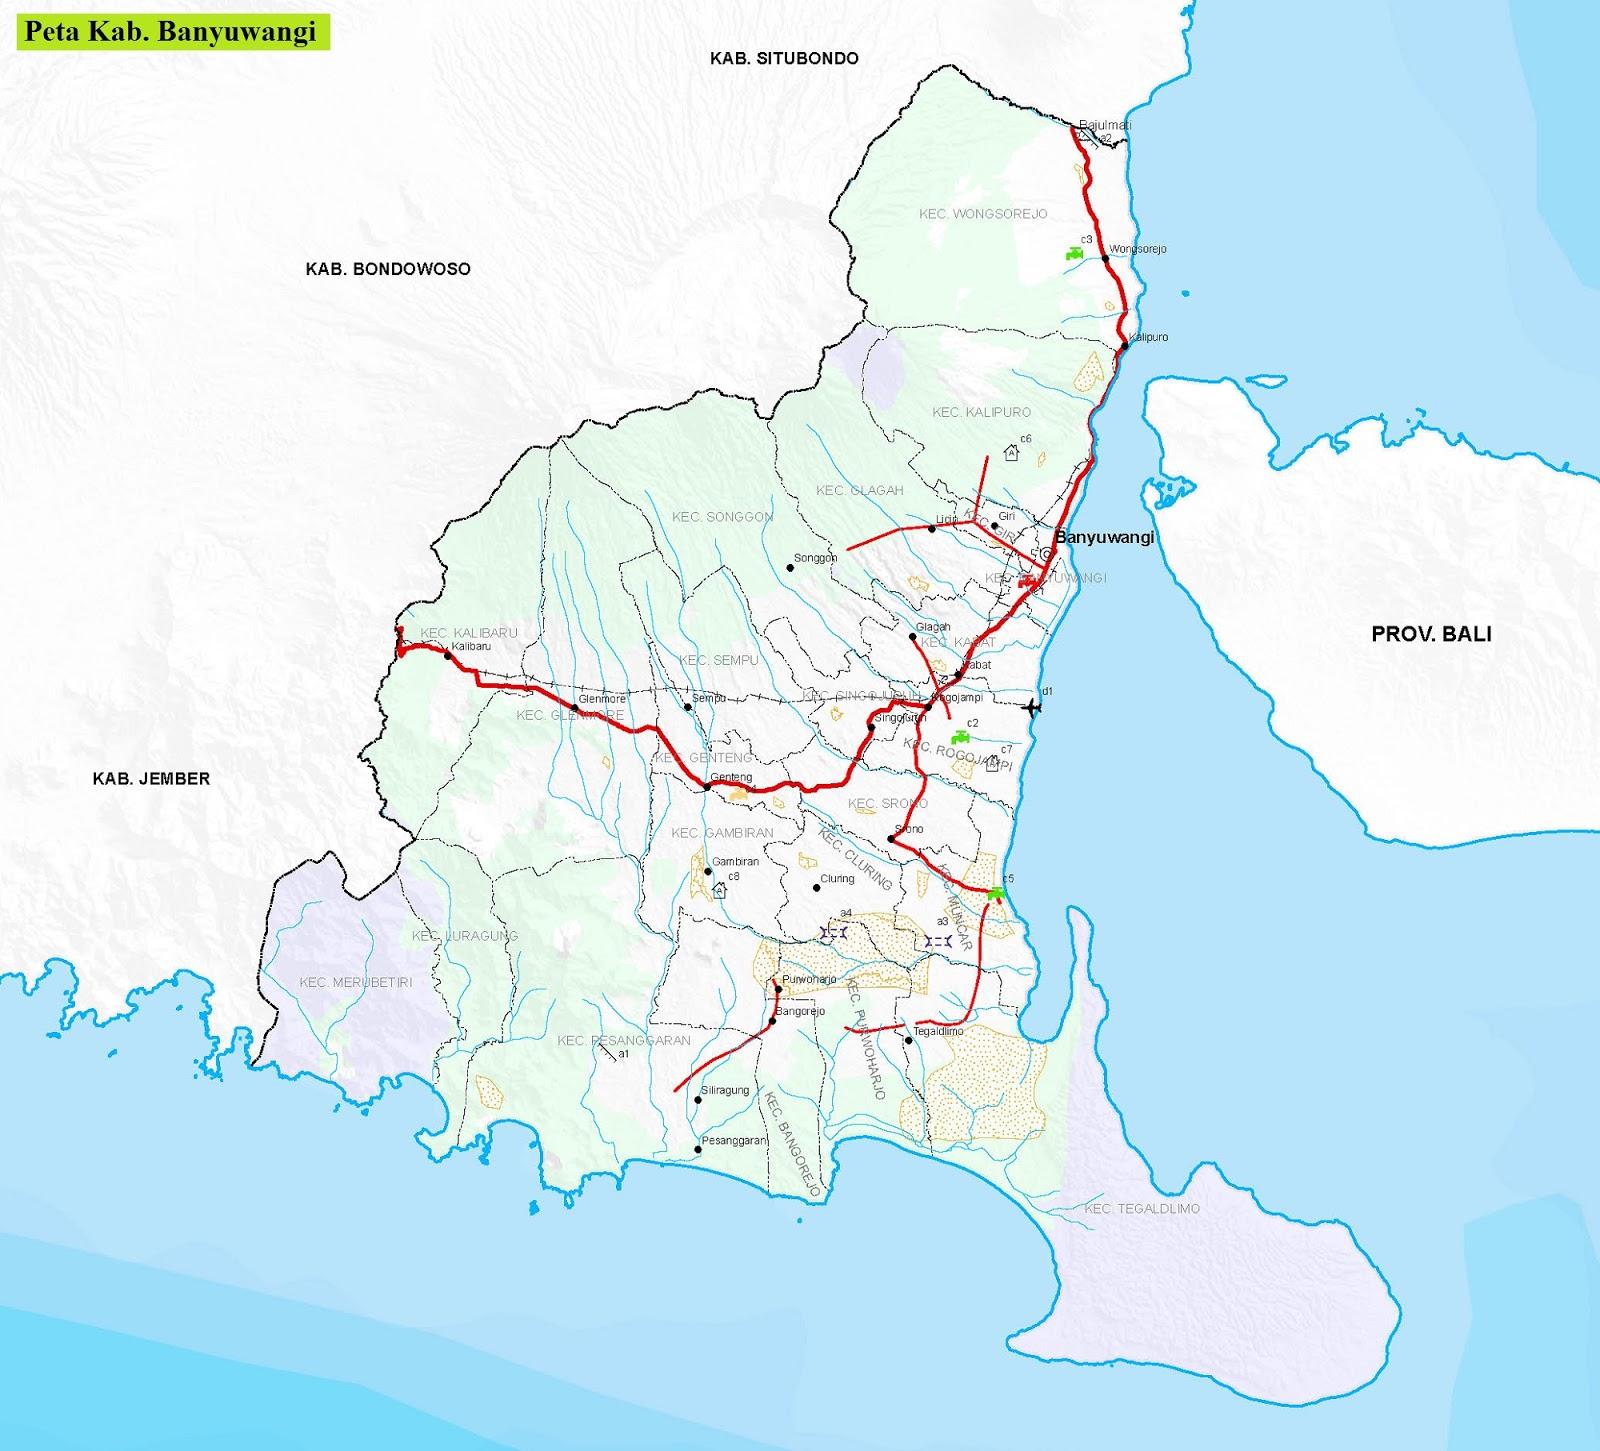 Peta Kabupaten Banyuwangi HD